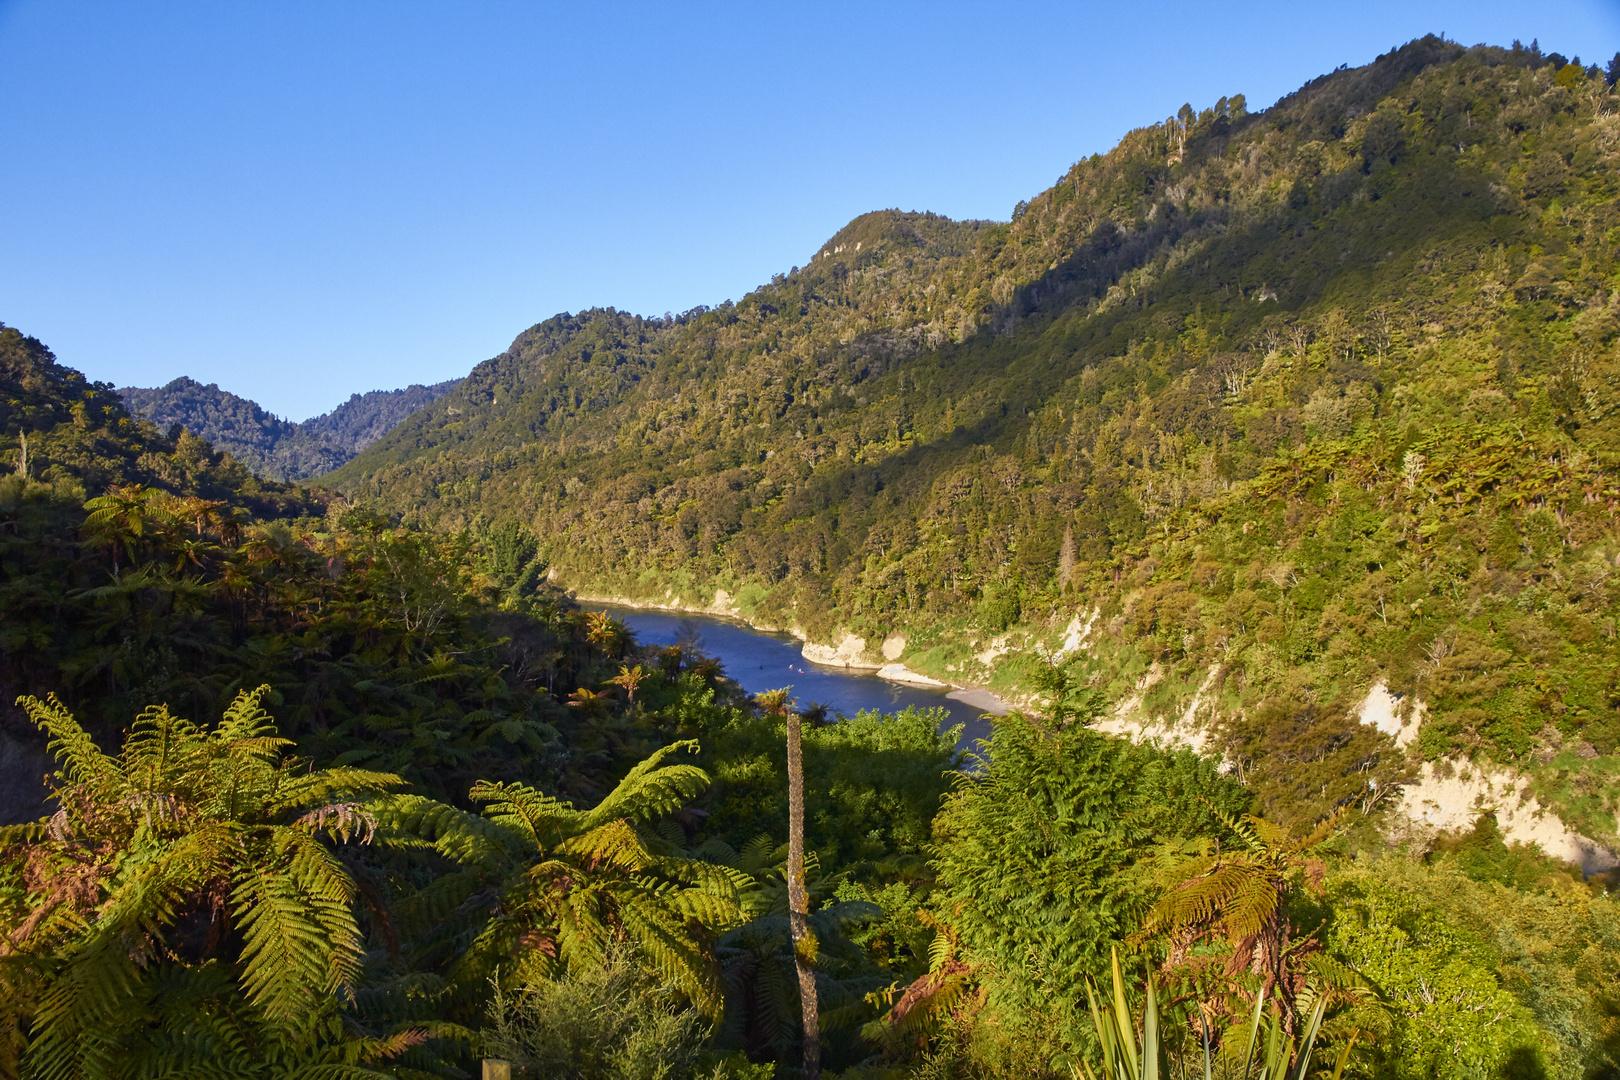 Abendsonne am Wanganui River